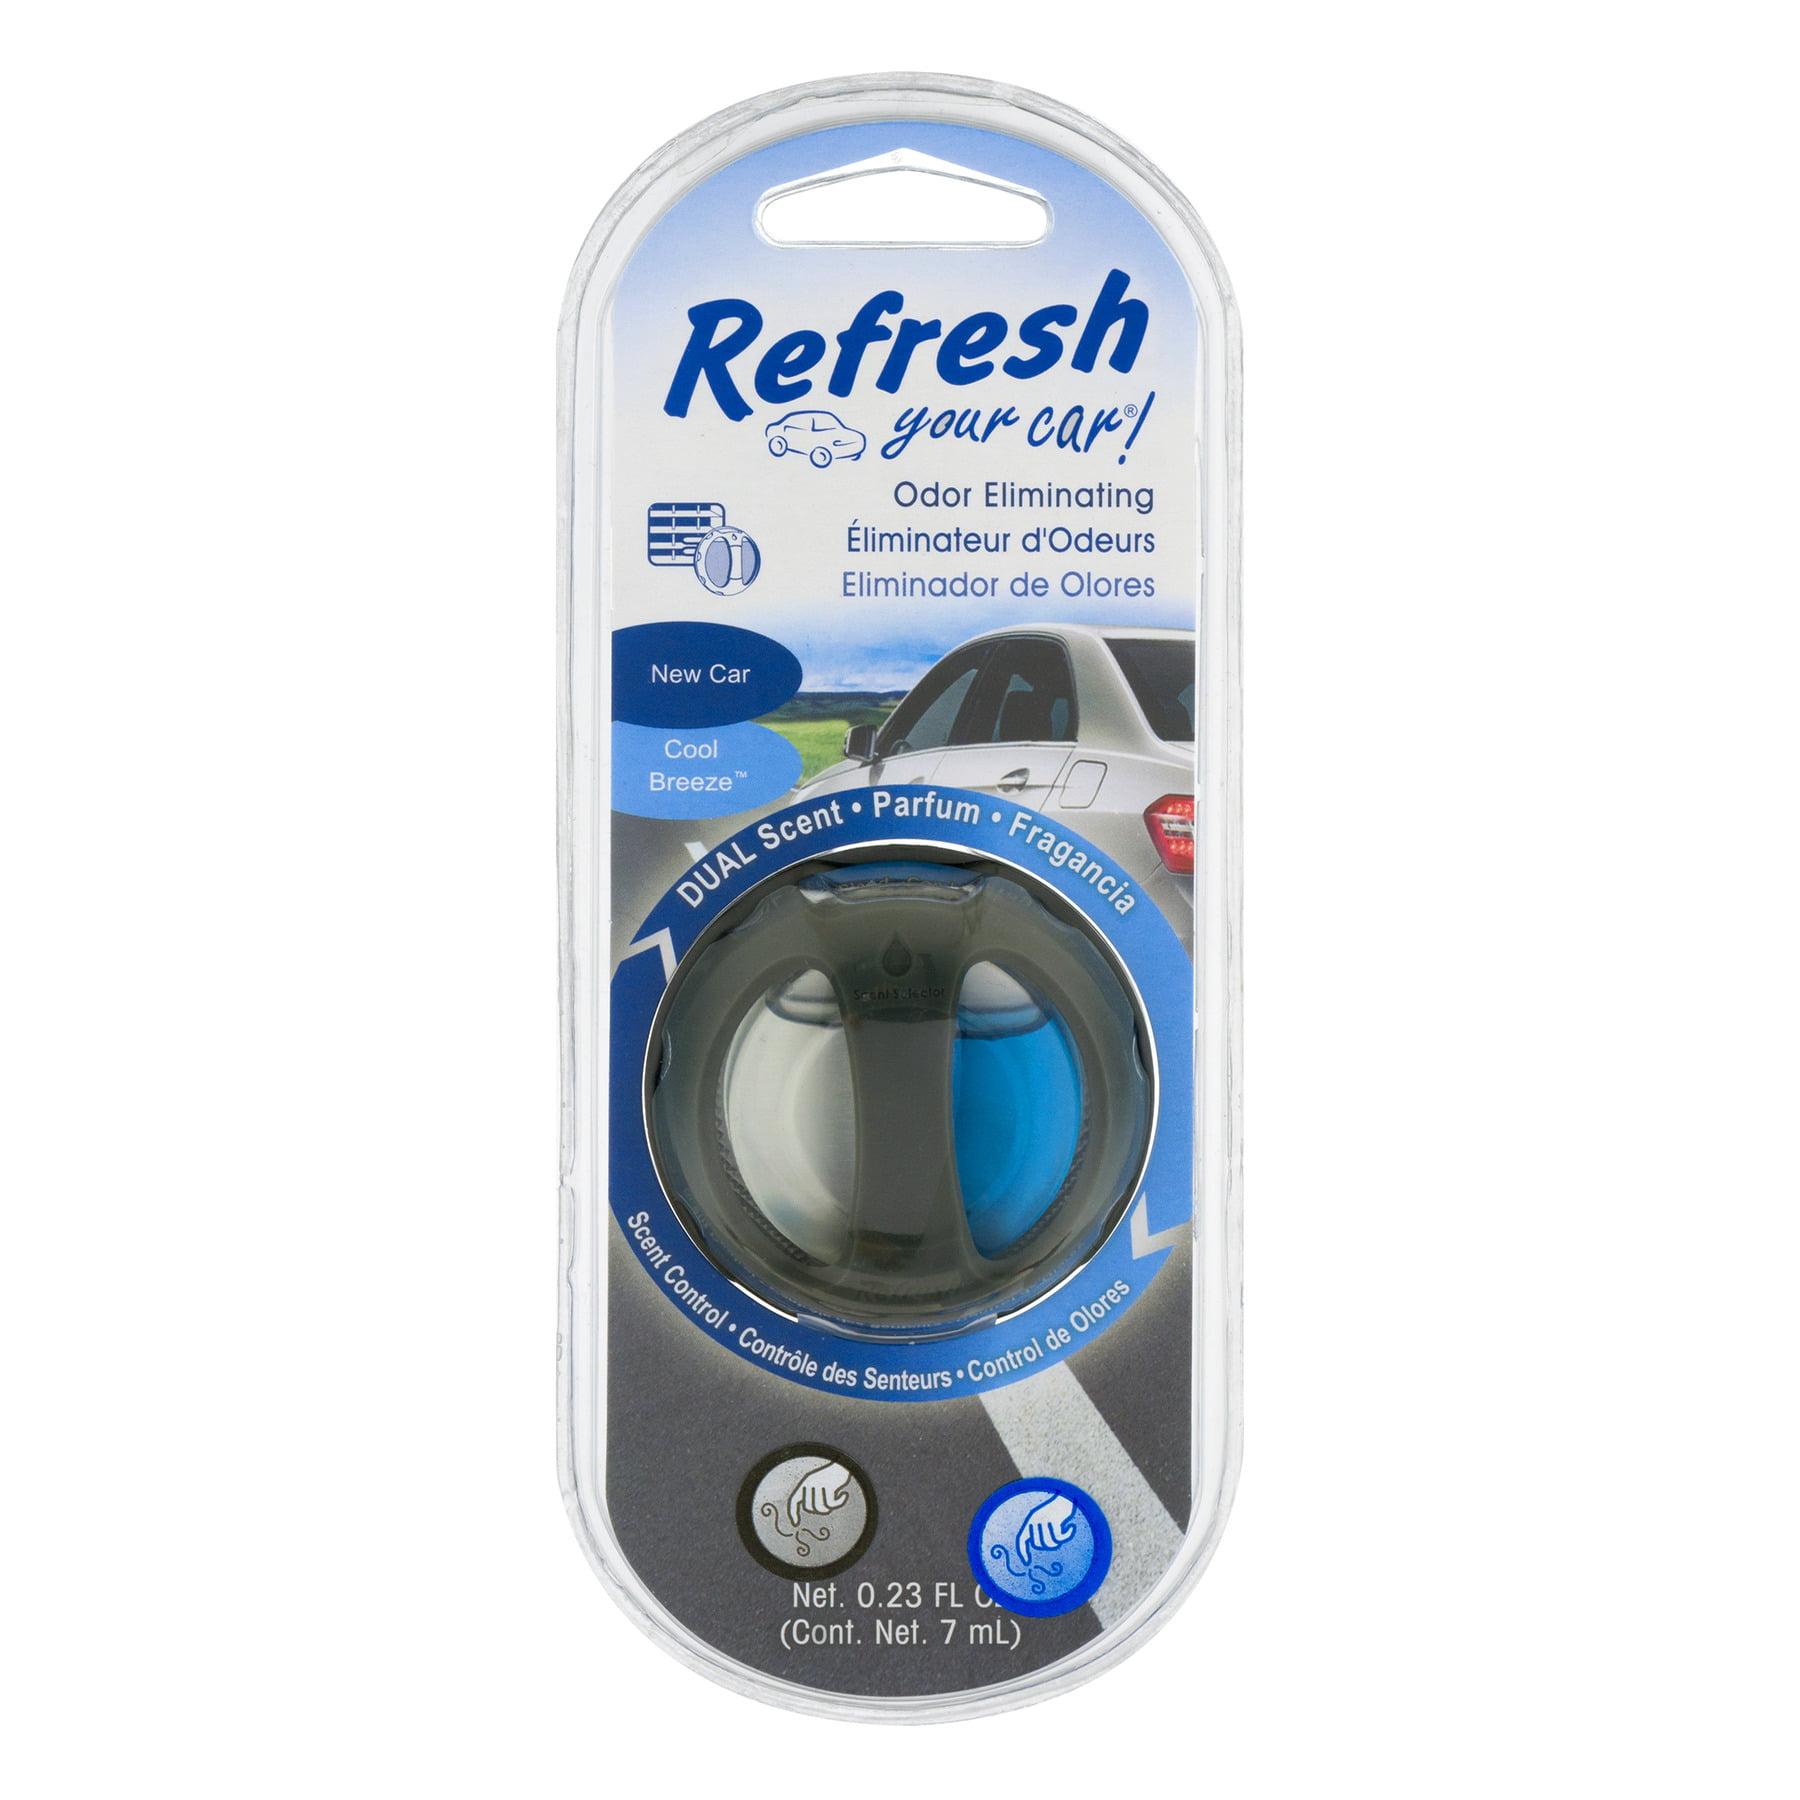 Refresh Your Car Cool Breeze Dual Scent Odor Eliminating Scent Control, 0.23 fl oz